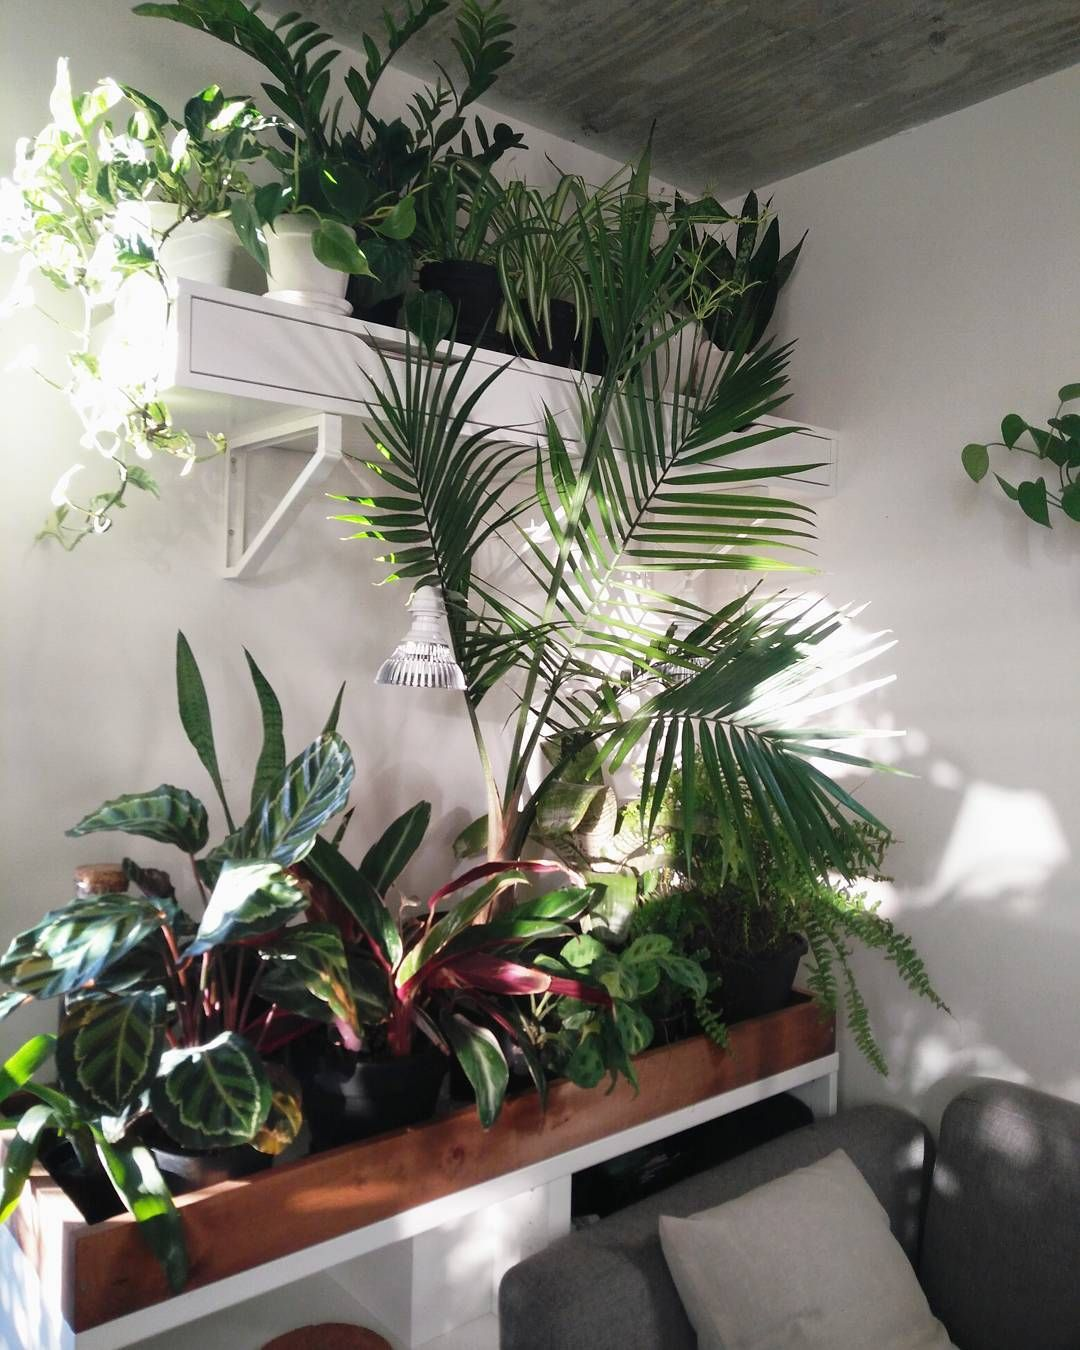 Buy home decorations online also pin by anita schm de illemann on decor indoor plants rh pinterest